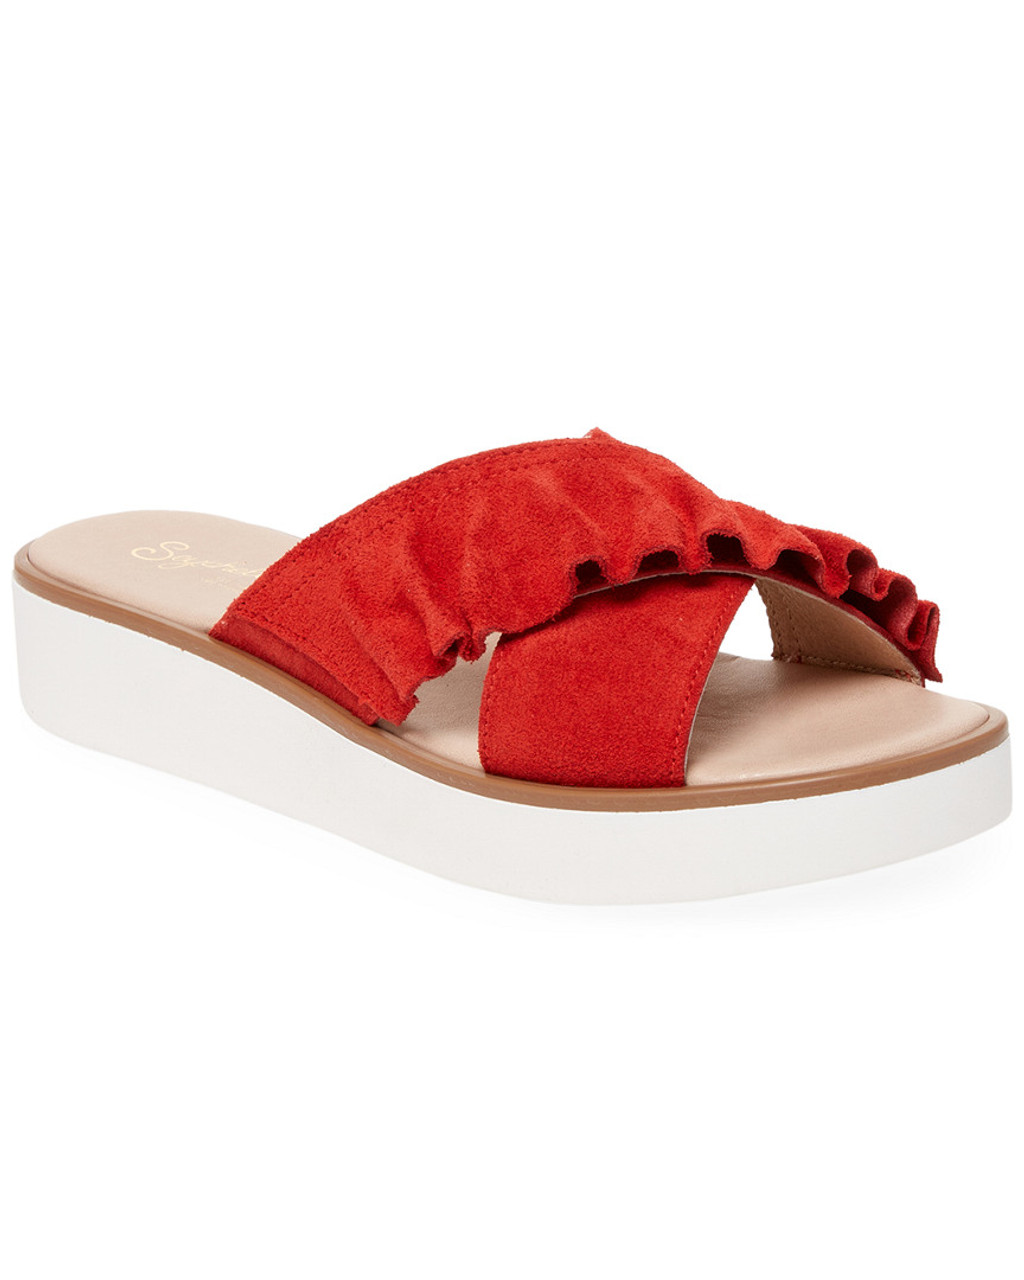 411fcb48ff Seychelles Suede Ruffle Slide~1311801559 - Bon-Ton